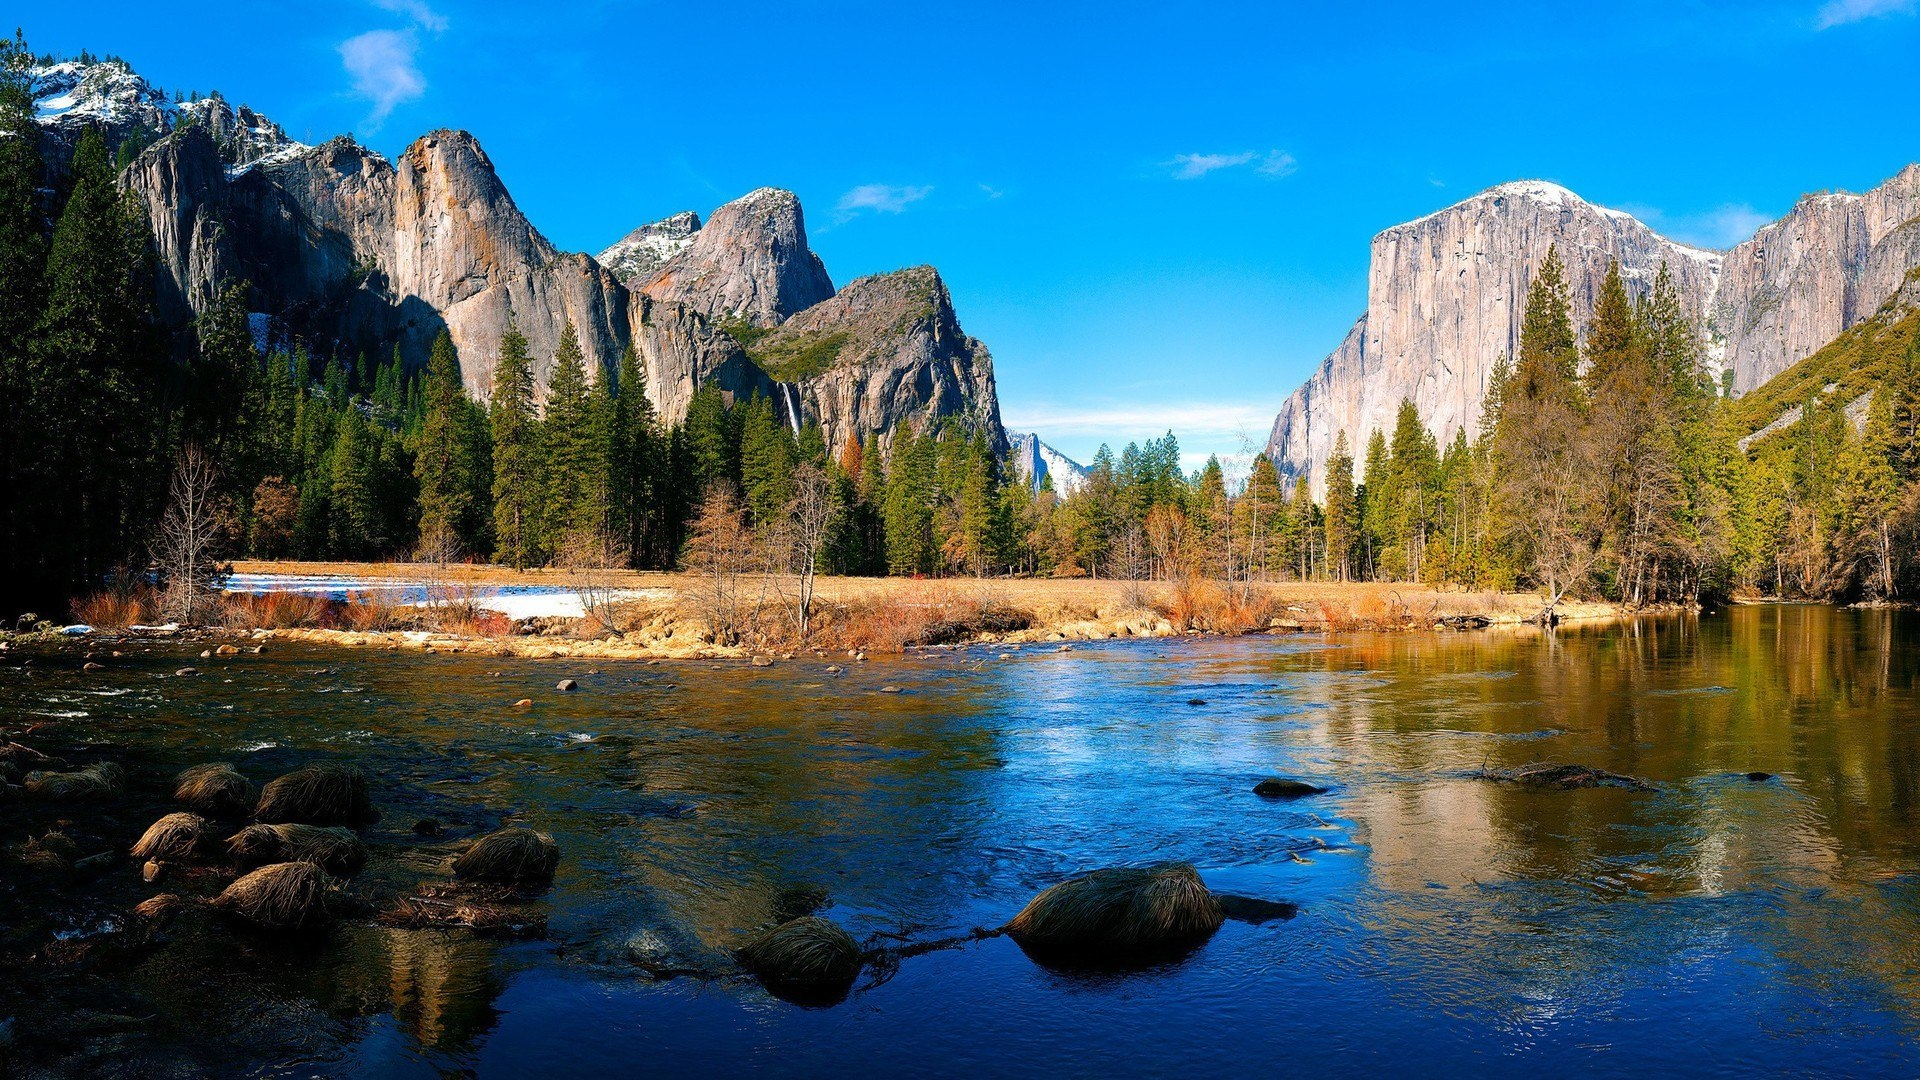 Background image yosemite - Yosemite Mountain Landscape Wallpaper Hd 13 High Resolution Wallpaper